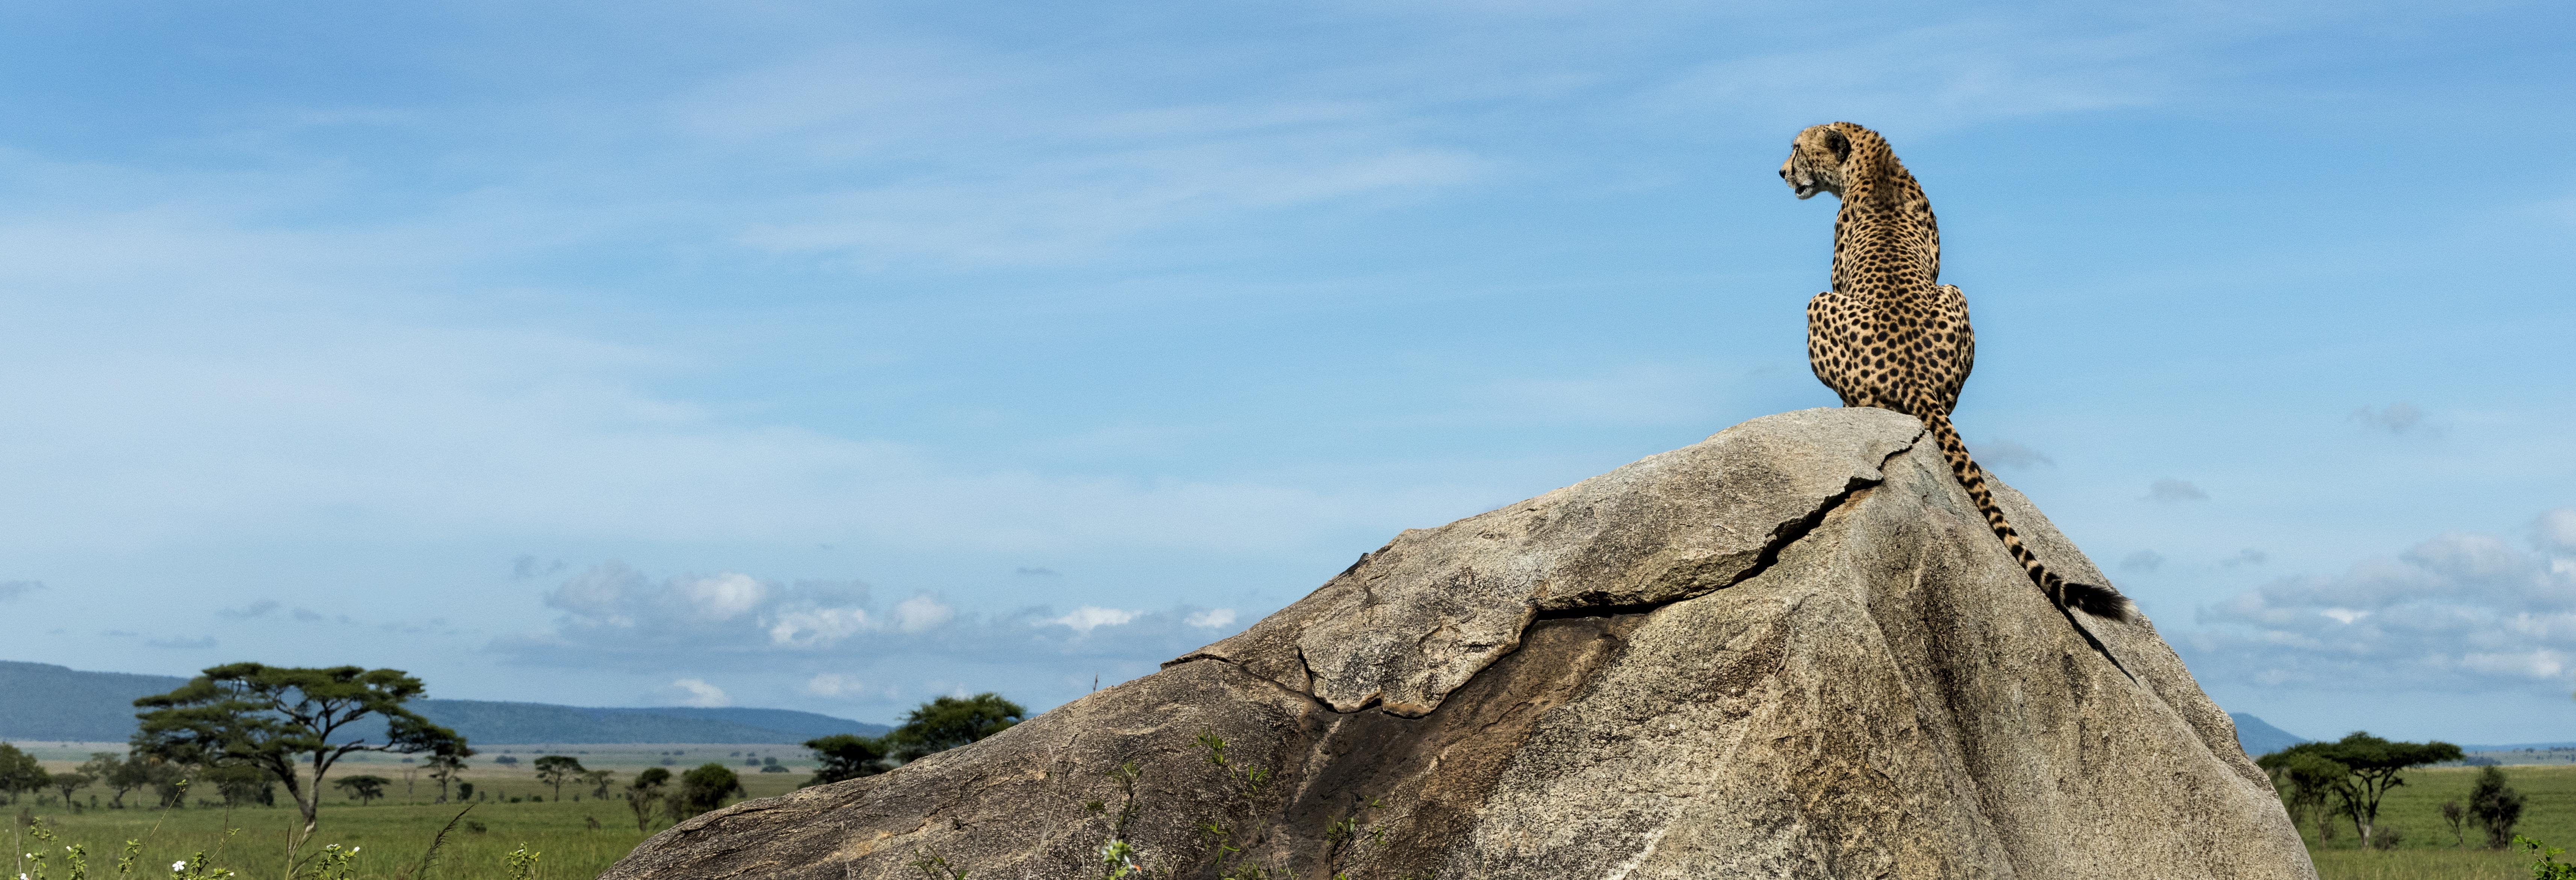 majestic cheetah on rock contemplating life